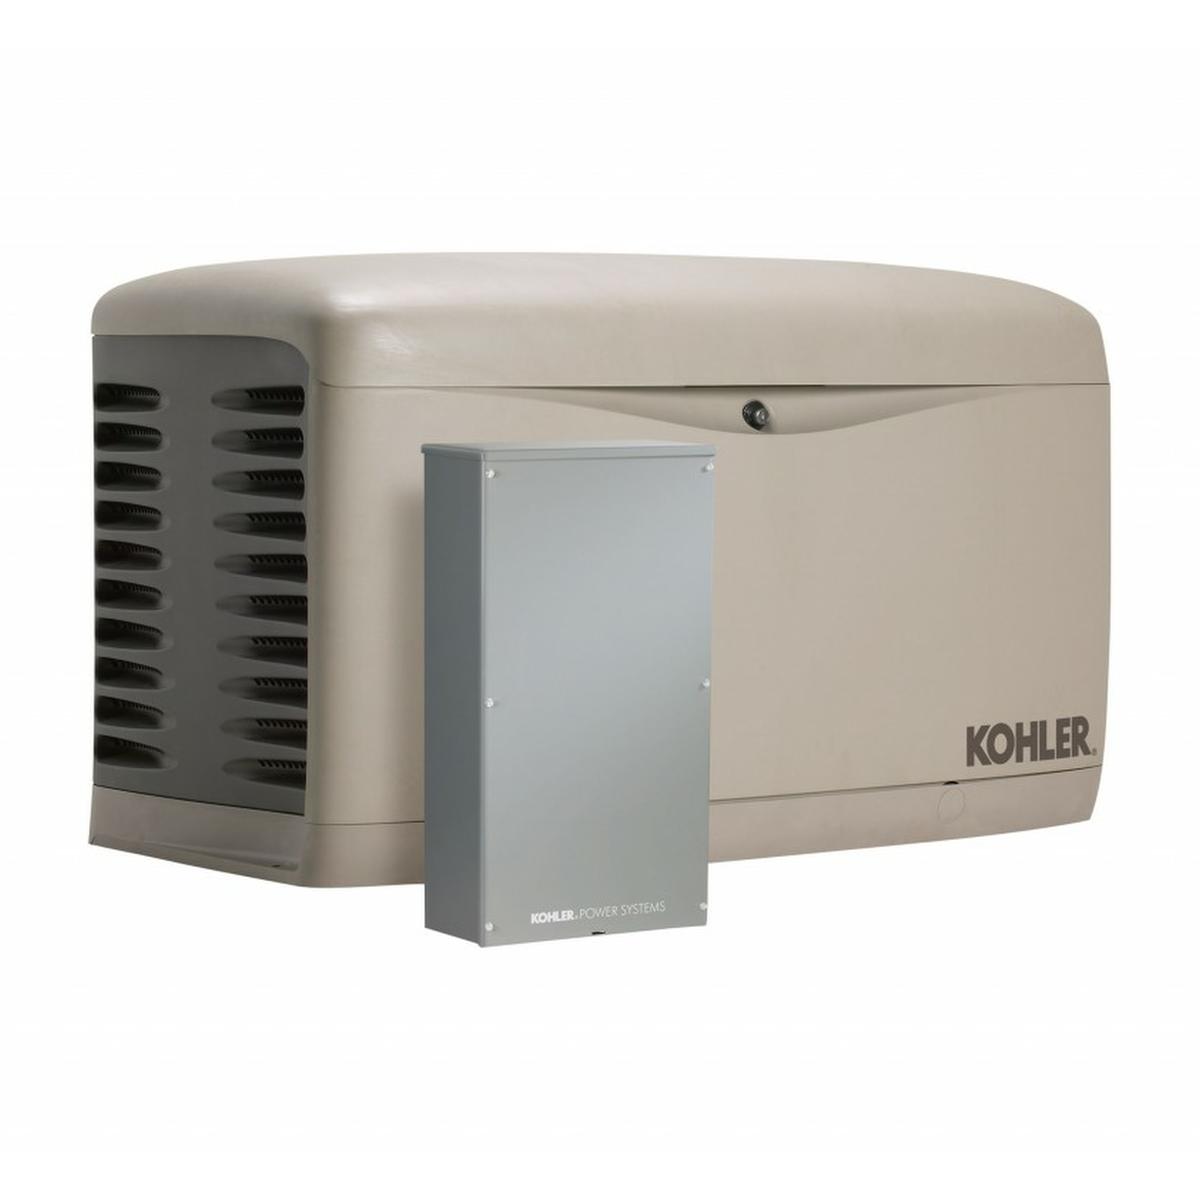 Kohler 14RESAL-200SELS 14kW Generator with 200A SE Transfer Switch